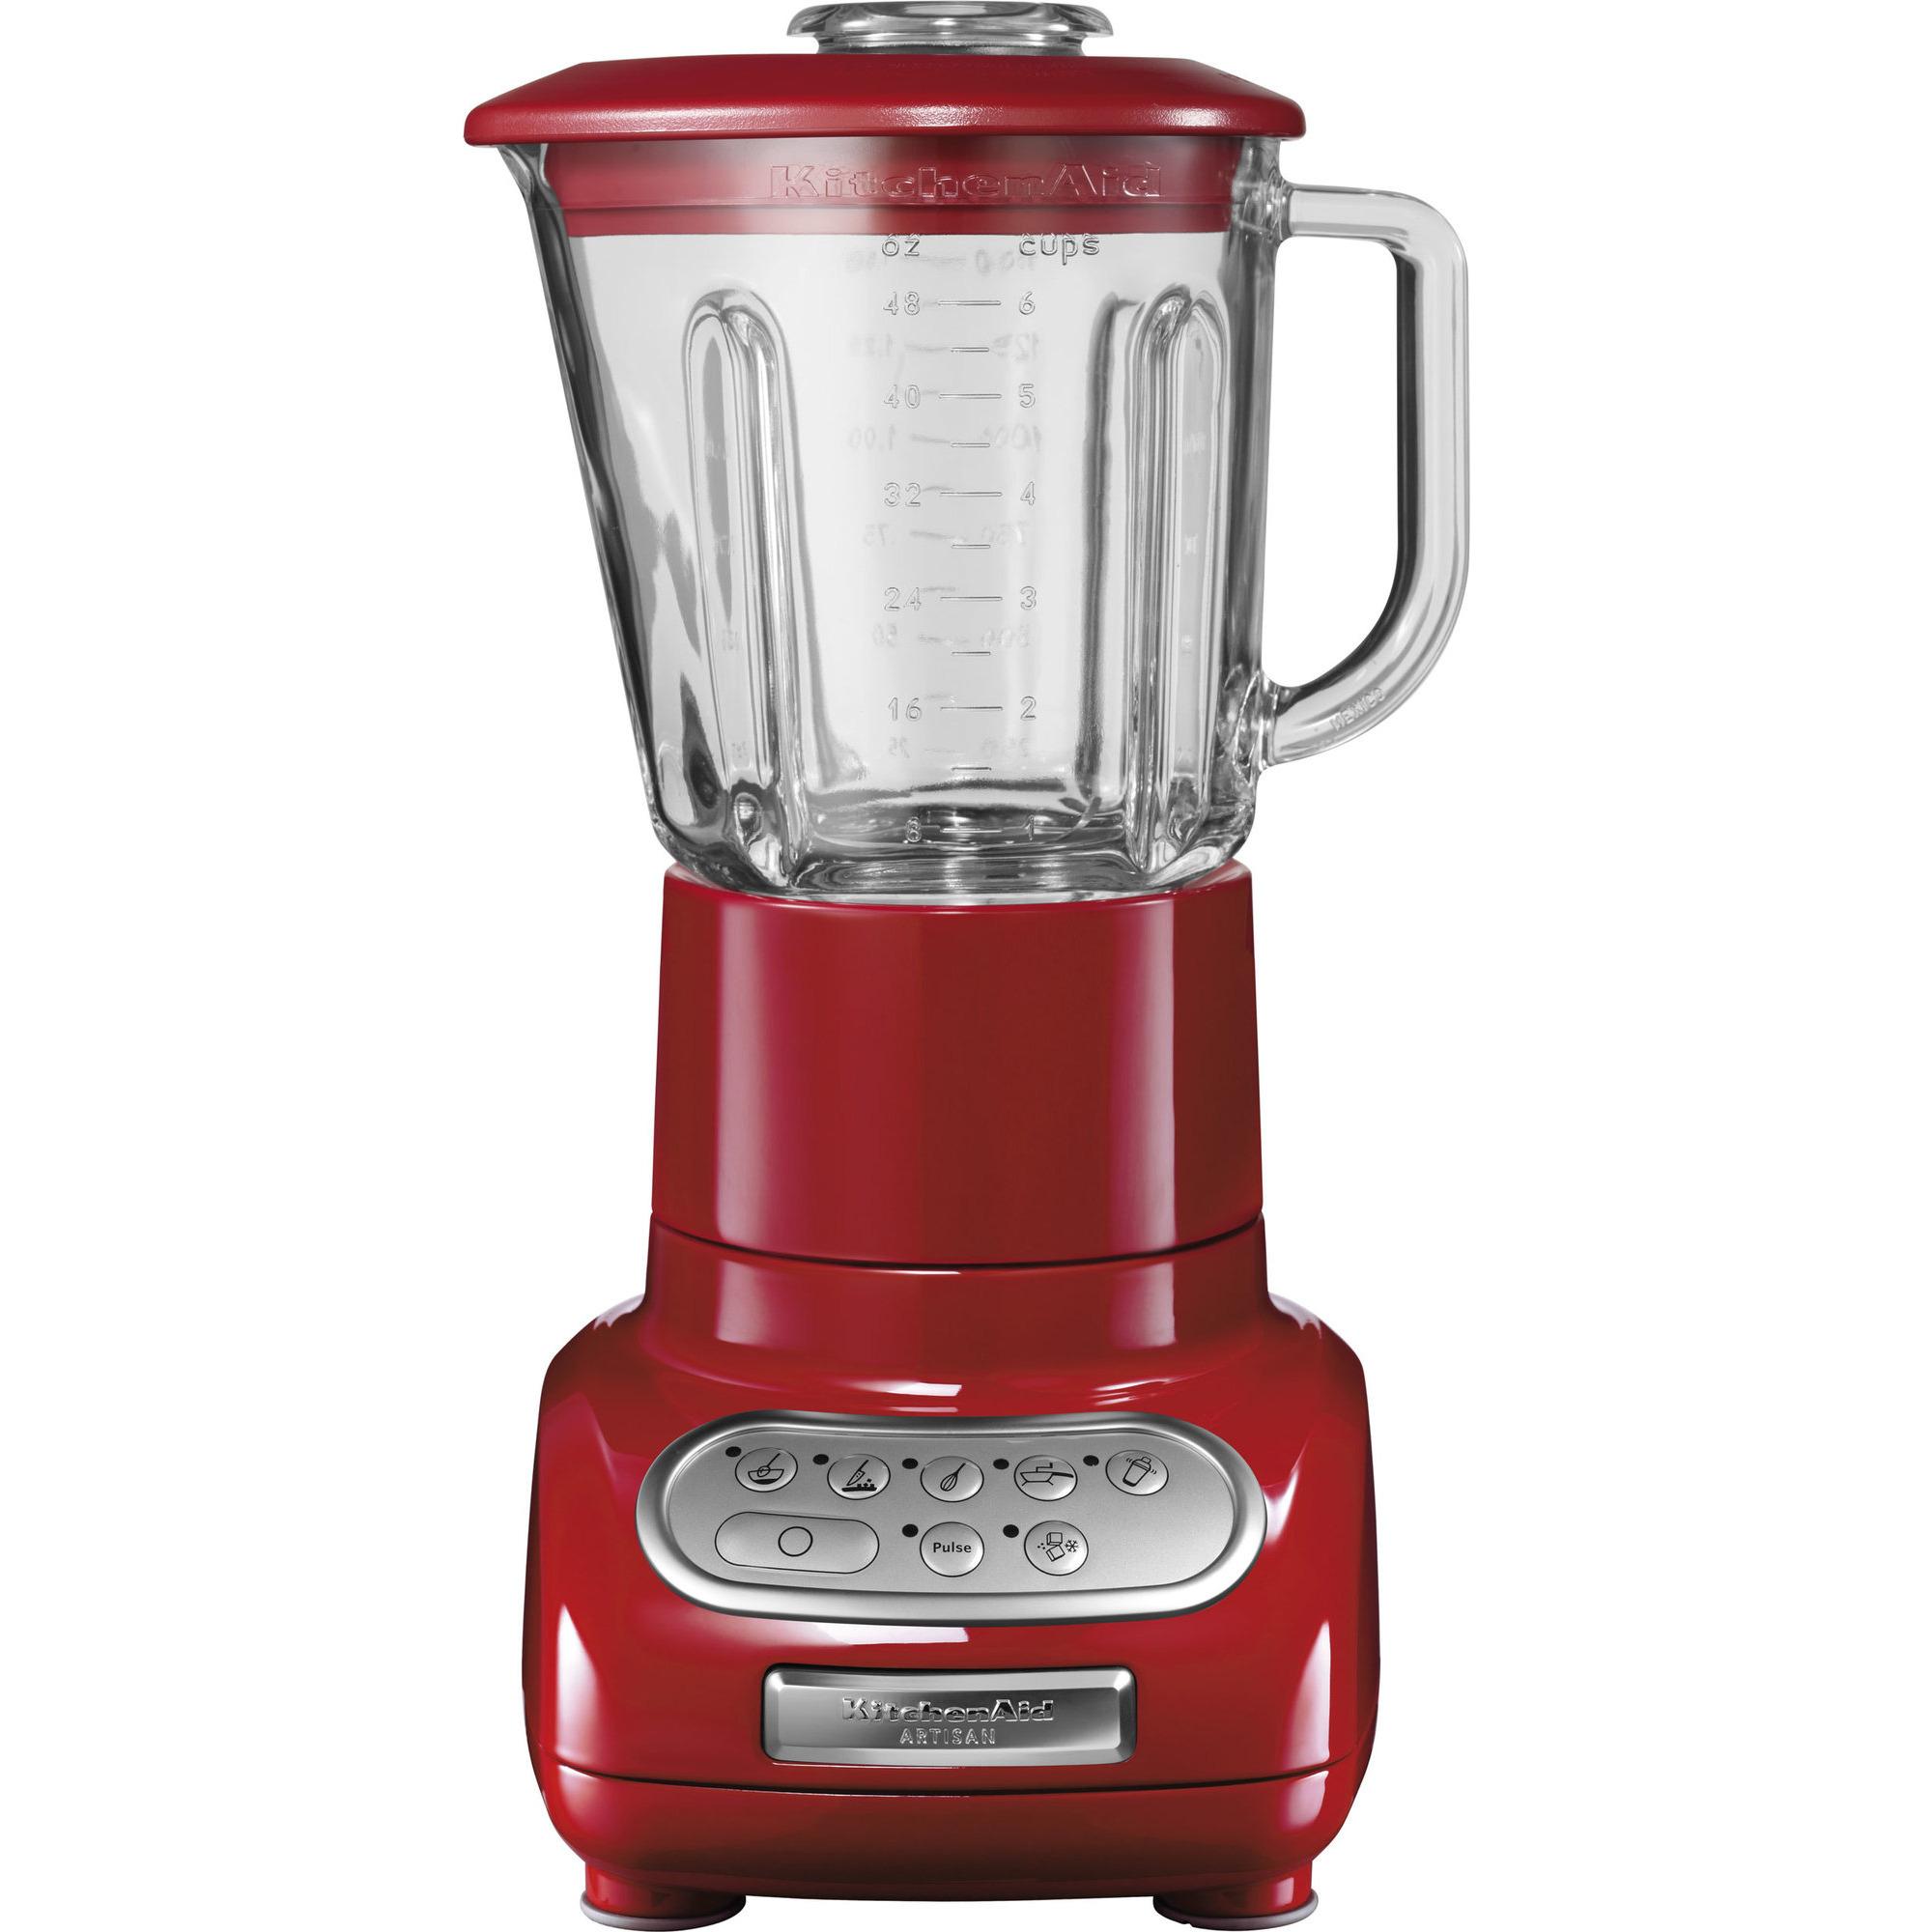 KitchenAid Artisan Mixer 5KSB555 Röd med Extra Minikanna